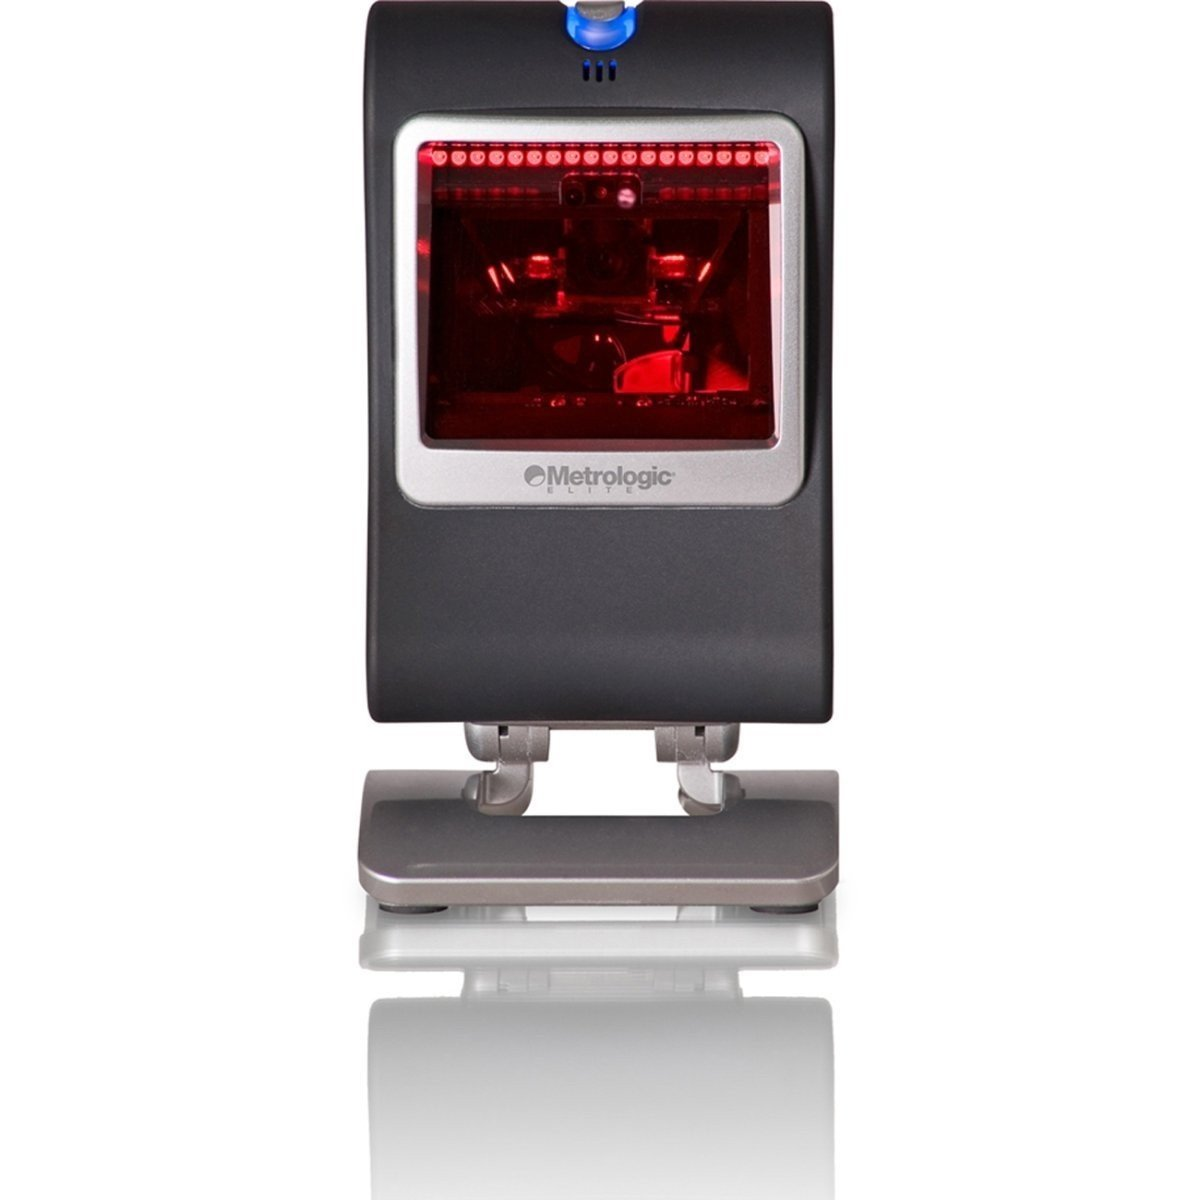 Metrologic MS7580 Genesis MK7580-30B38-02-A